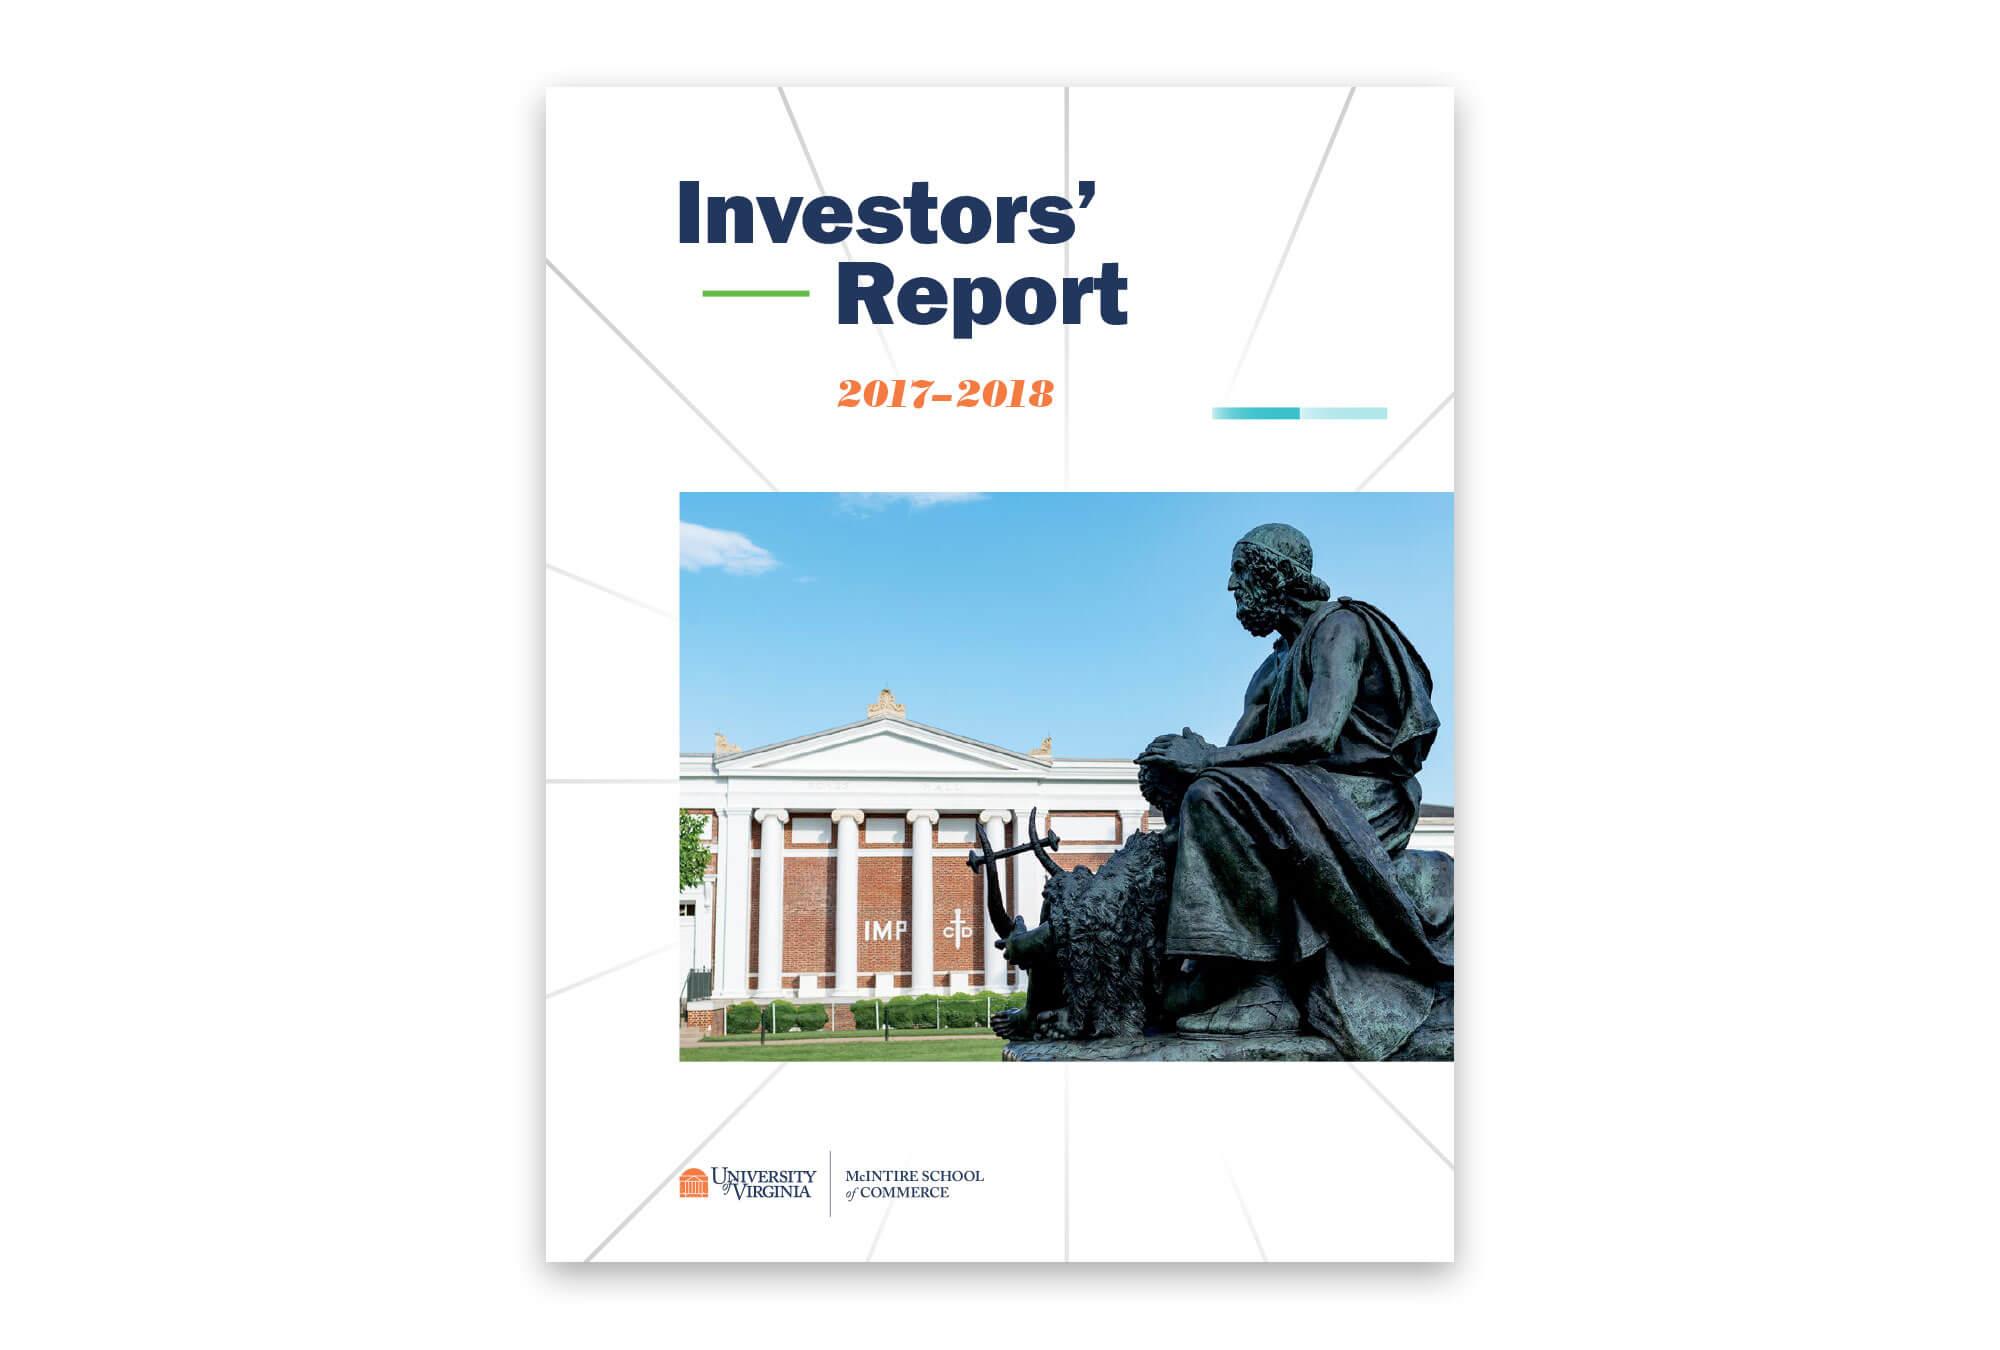 Investors Report cover